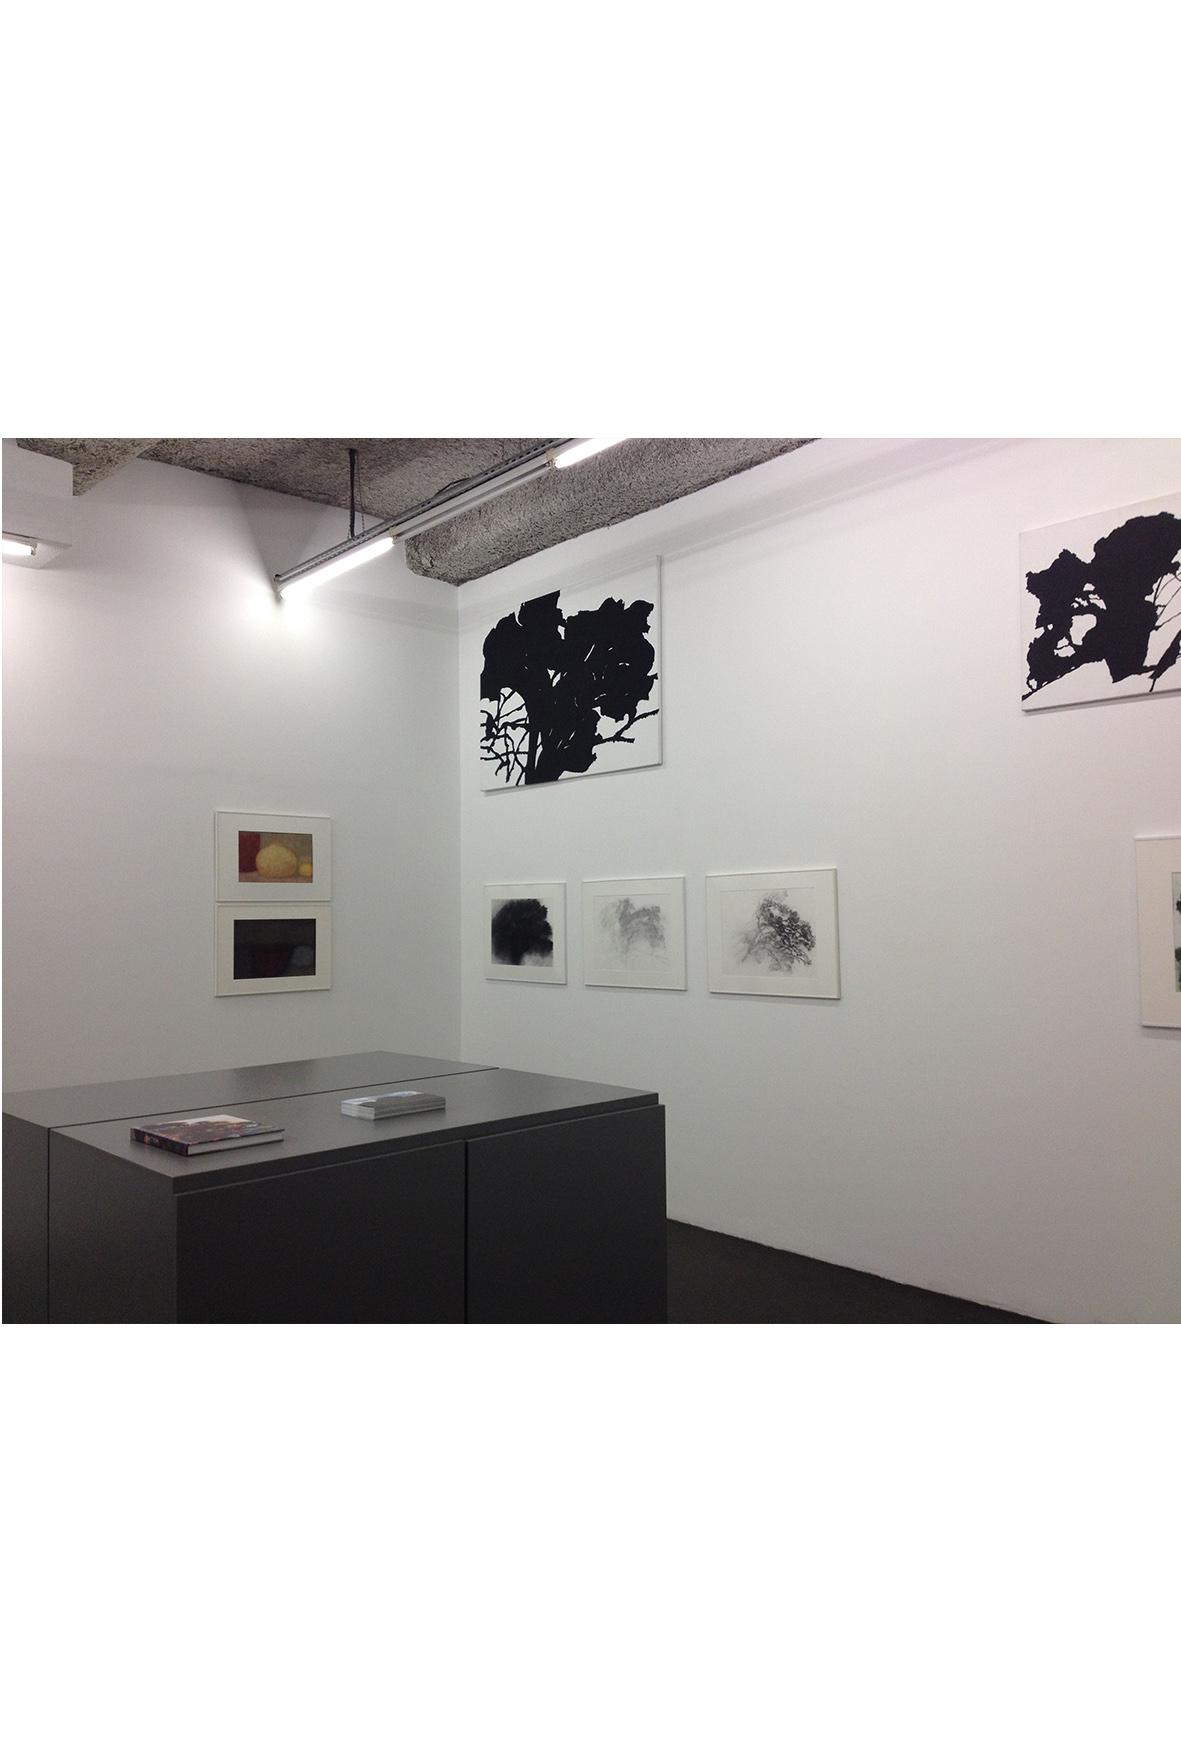 ALexandre Hollan, galerie d'art lyon, art contemporain lyon, galerie Lyon